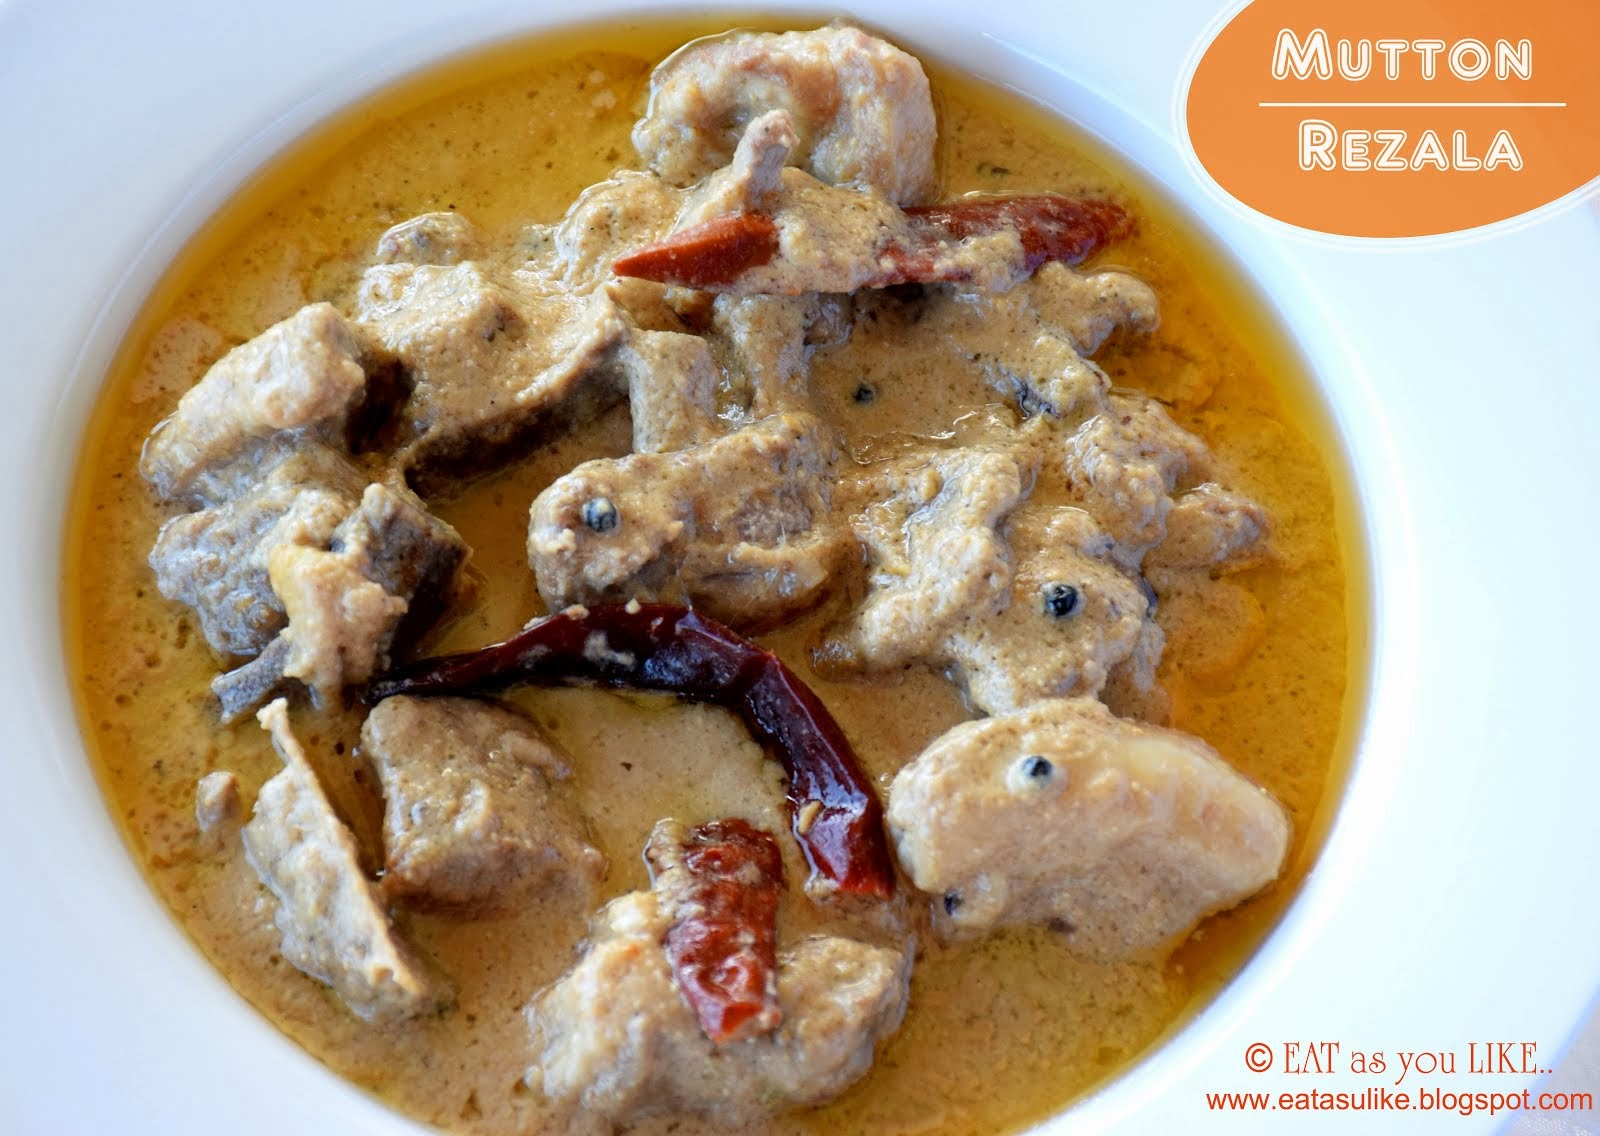 Mutton Rezala